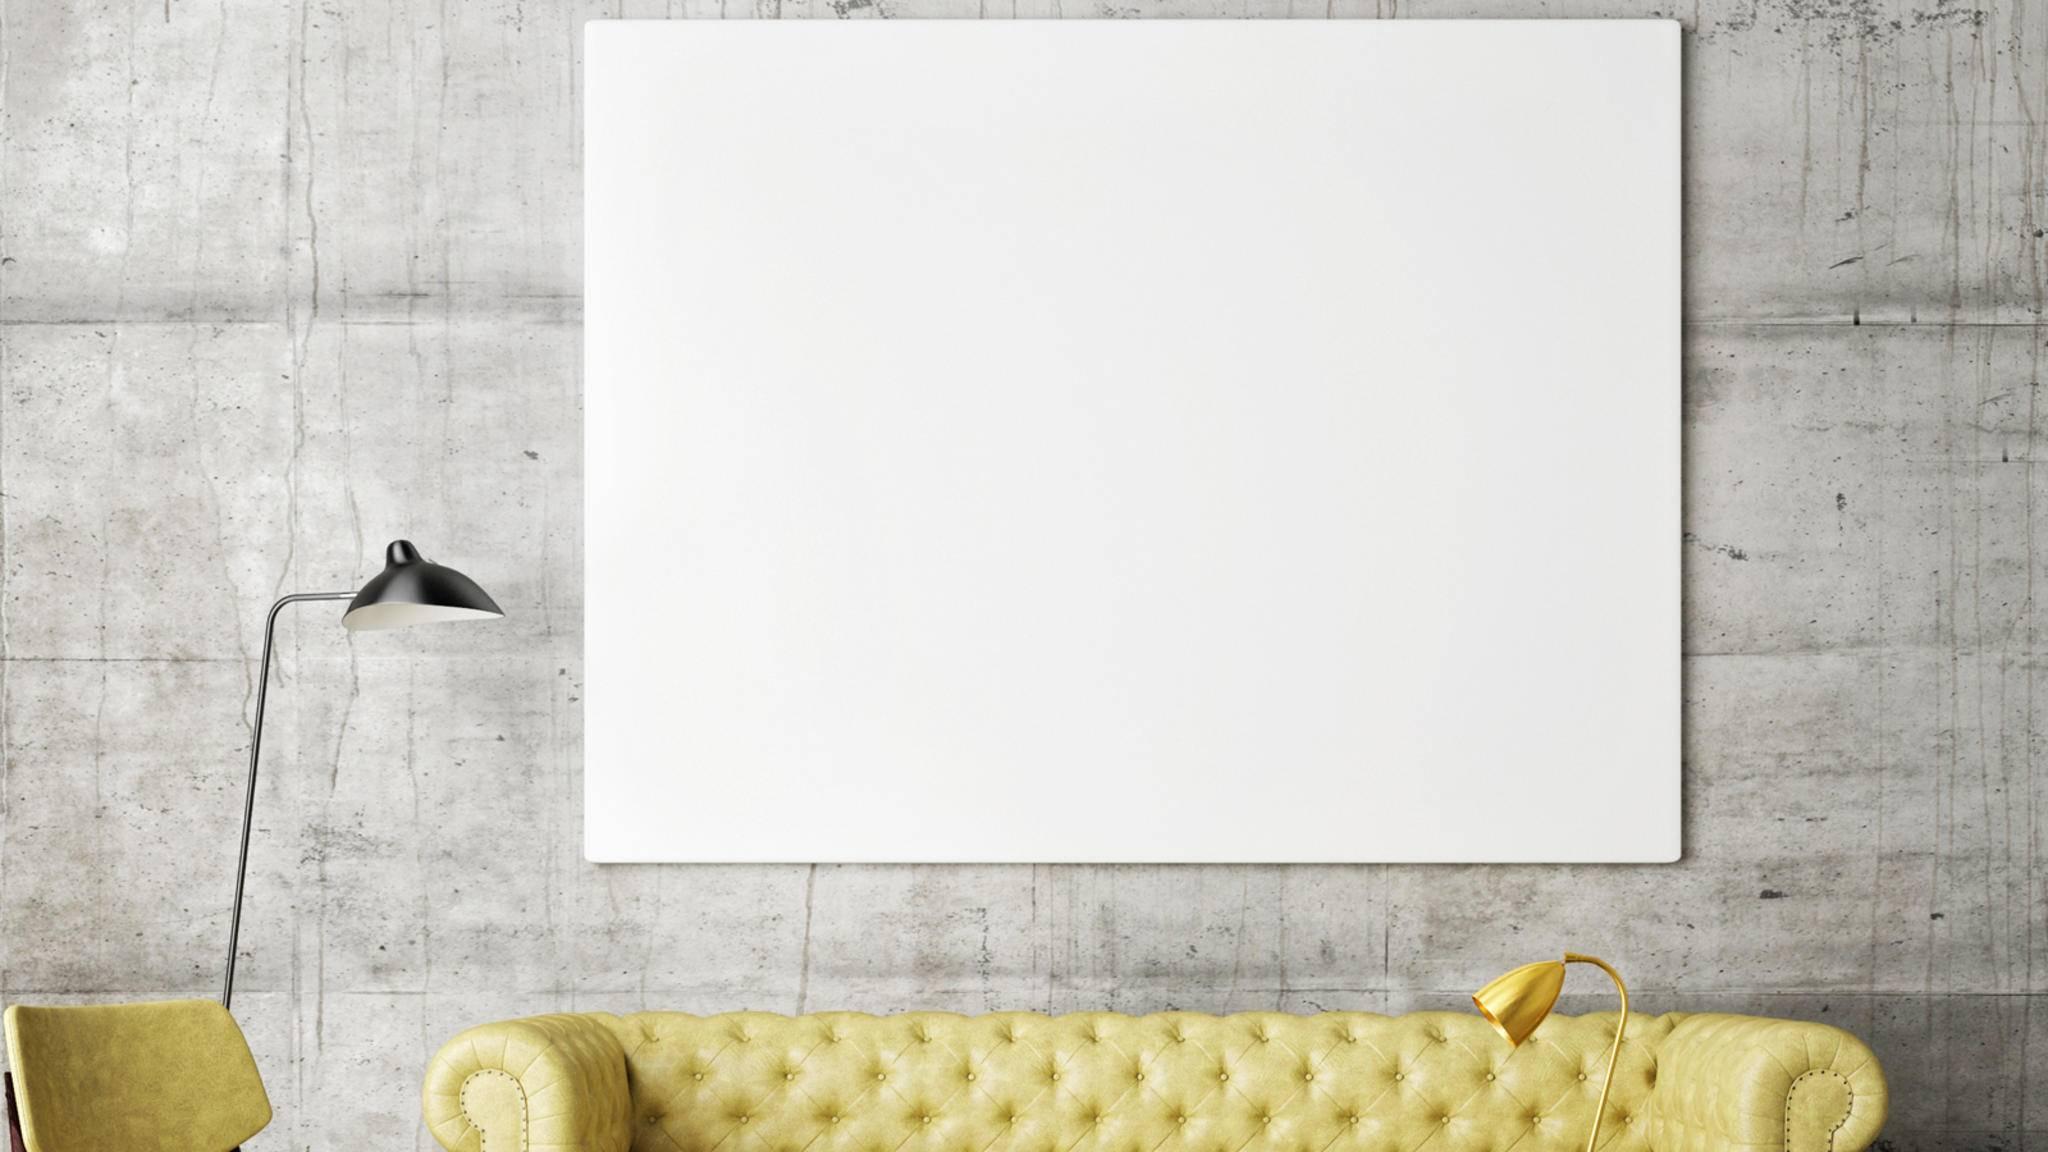 beamer leinwand selbstbau stunning leinwand selber bauen den rahmen montieren with beamer. Black Bedroom Furniture Sets. Home Design Ideas